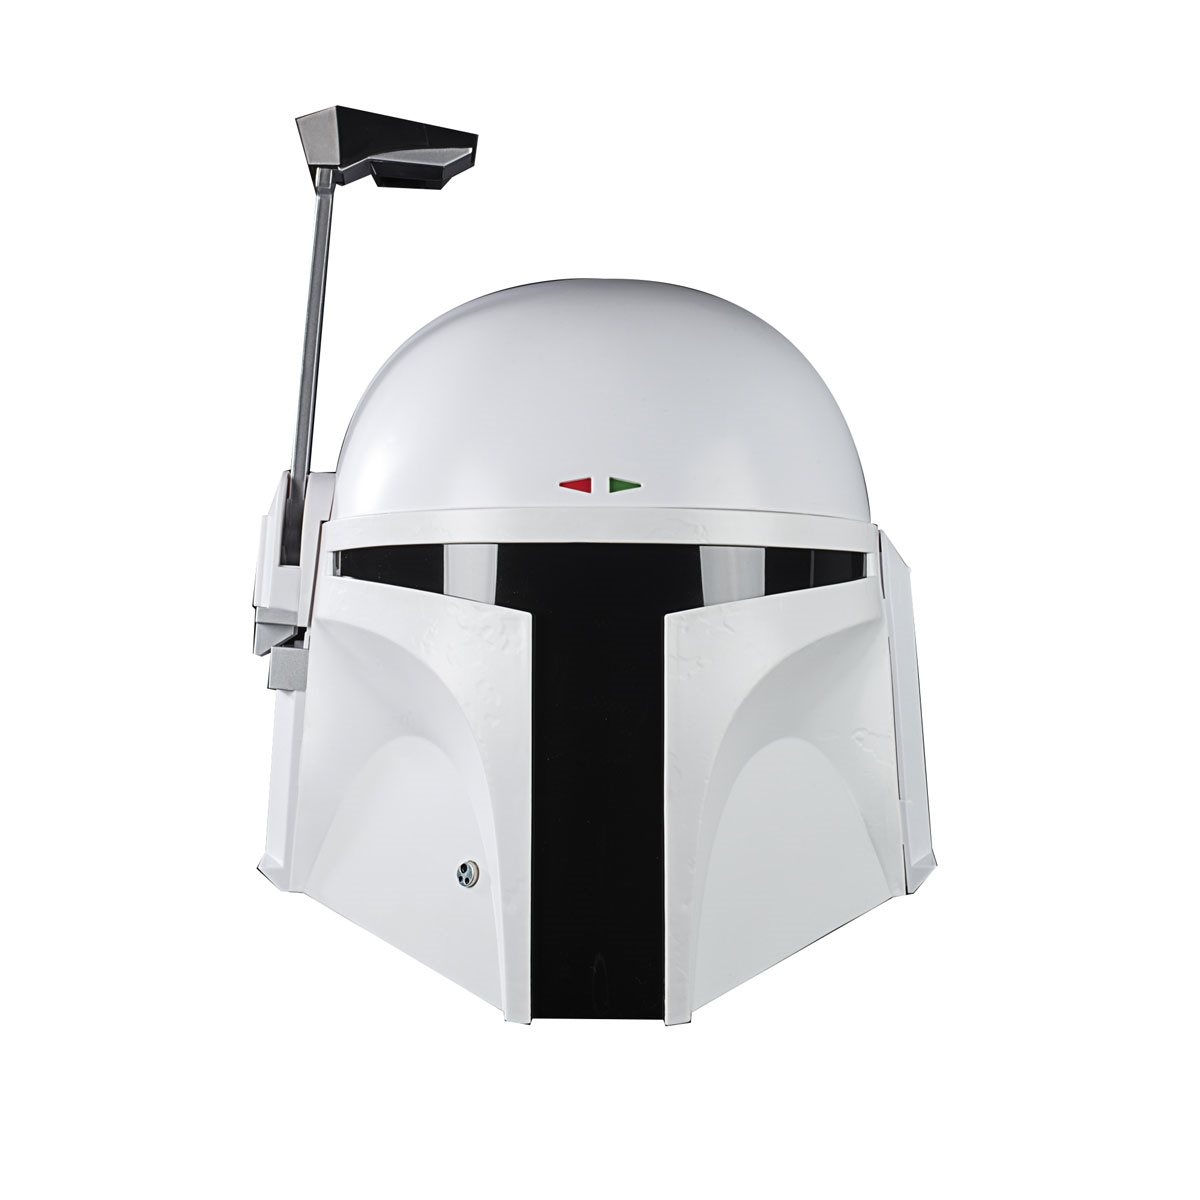 STAR WARS Black Series Boba Fett Premium Electronic Helmet 1:1 Replica